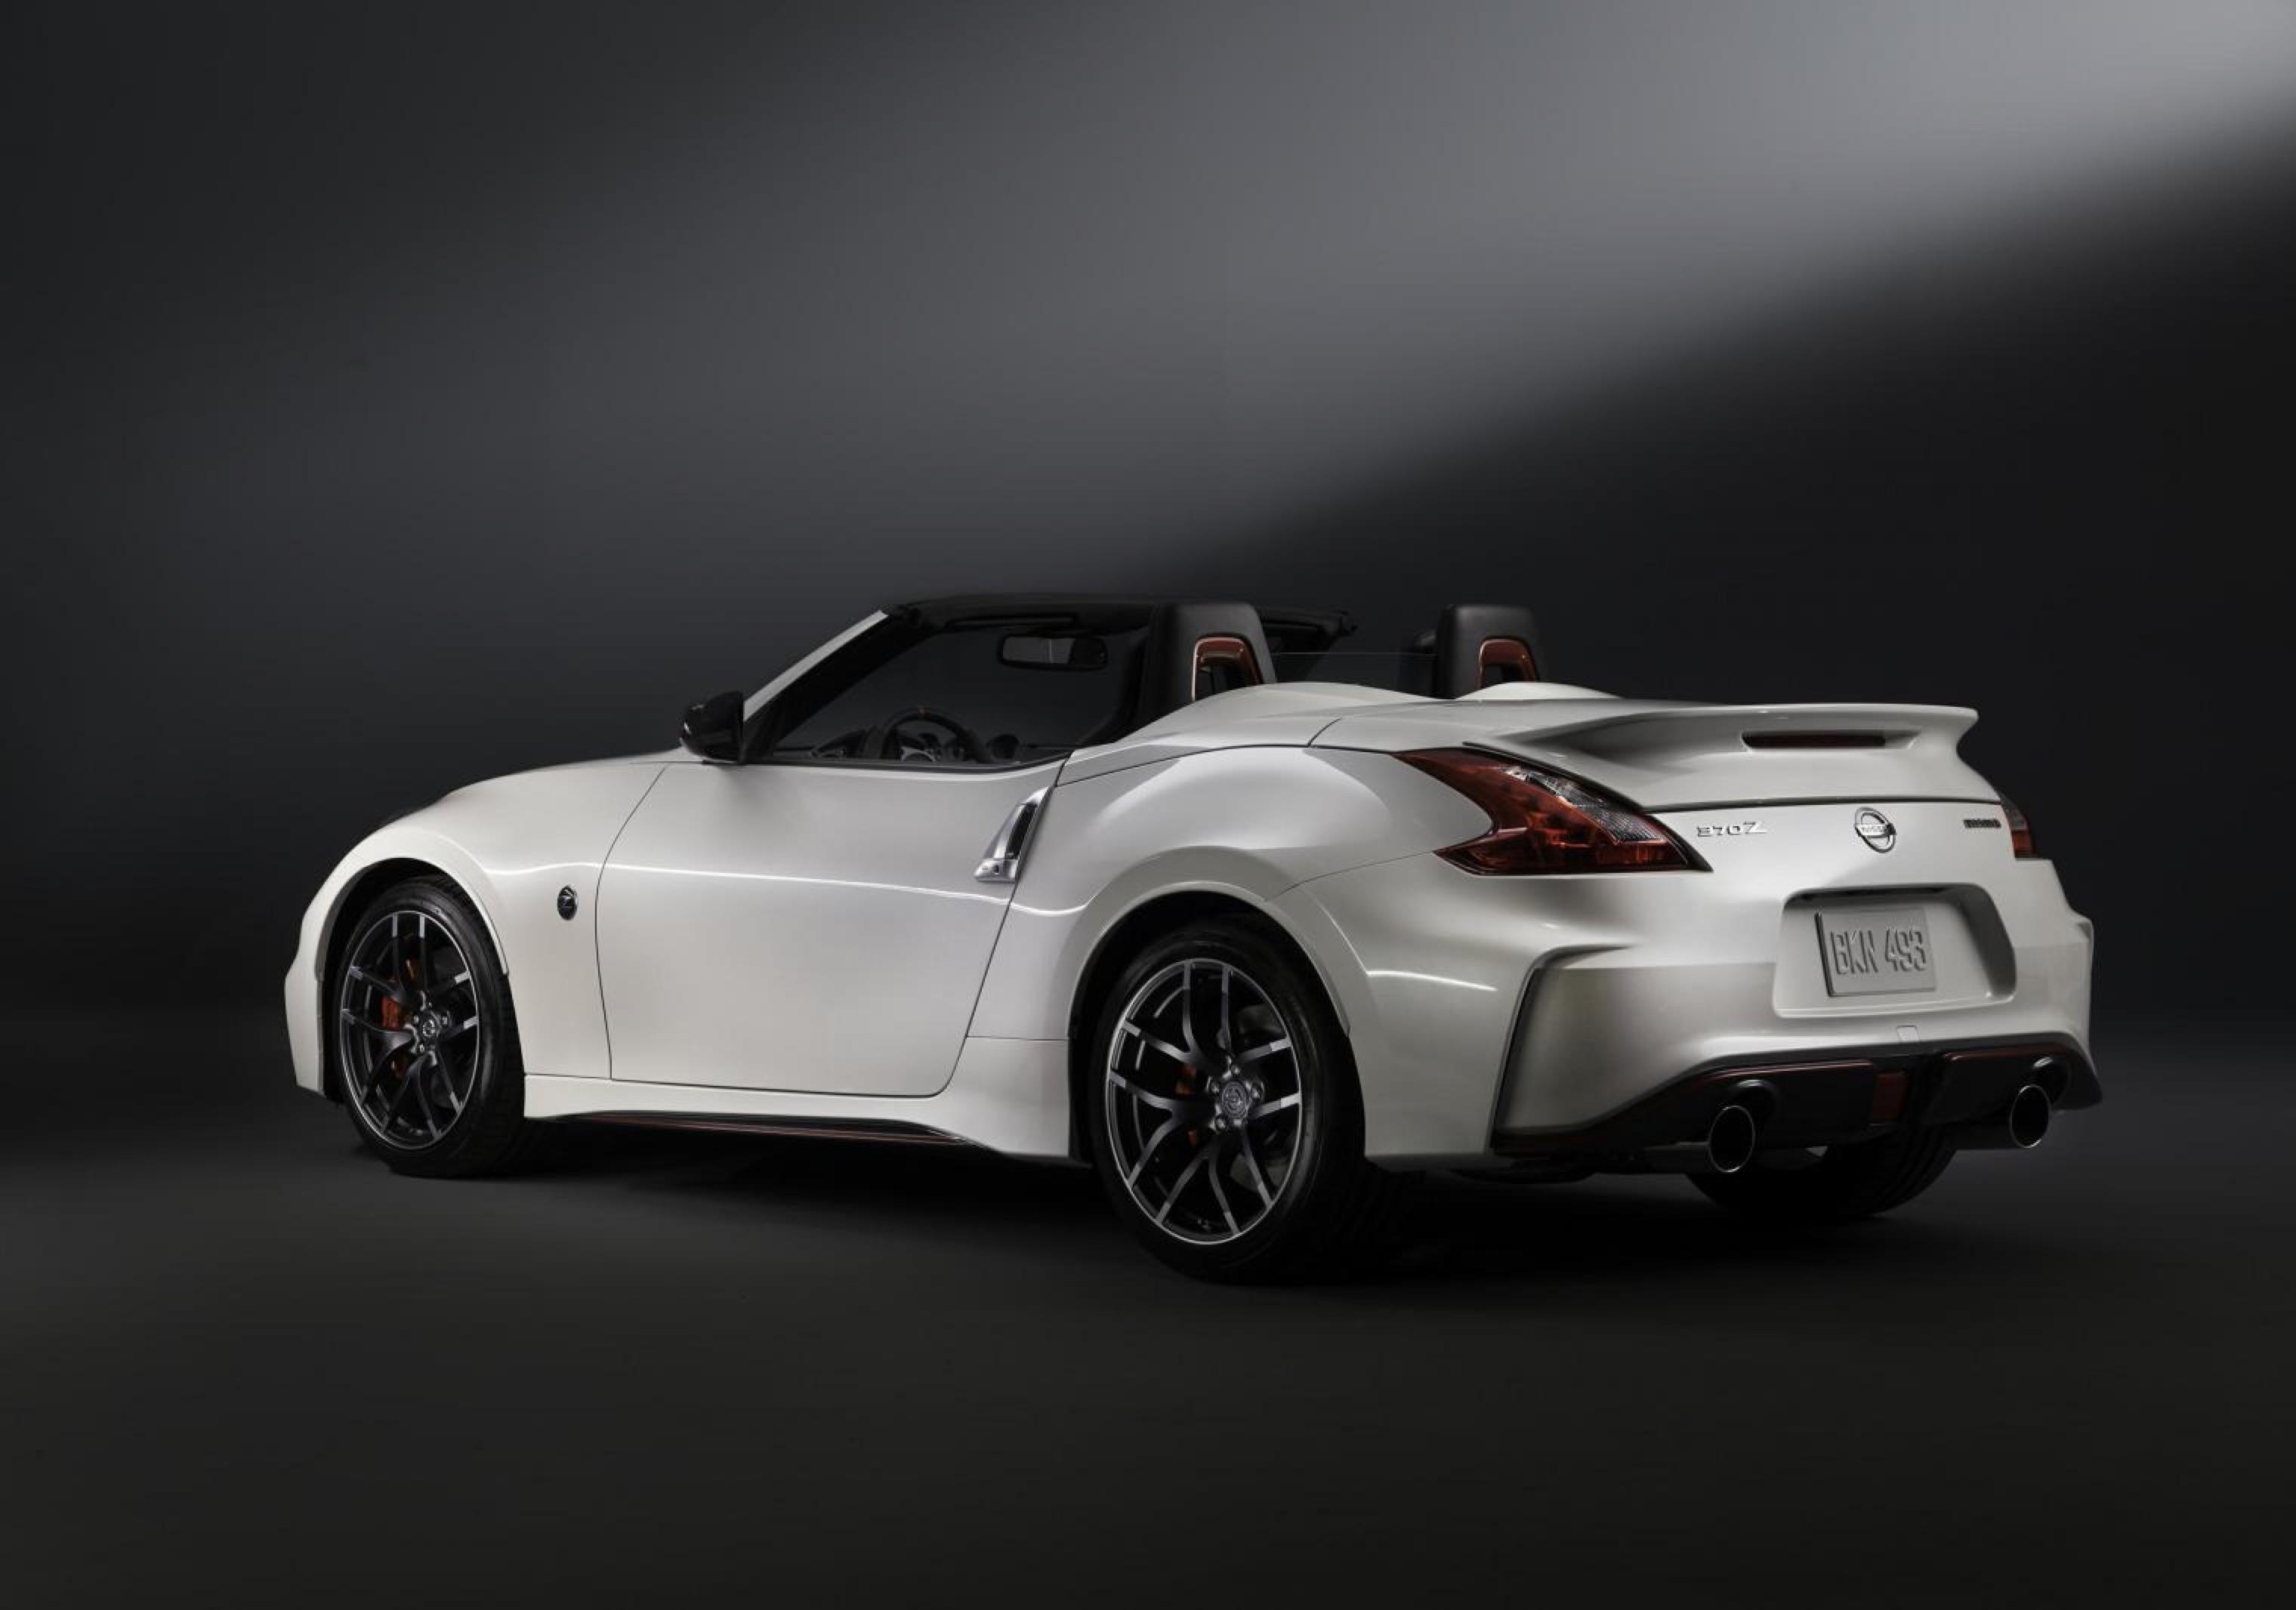 2015 nissan 370z concept review future cars 2015 future html autos weblog. Black Bedroom Furniture Sets. Home Design Ideas